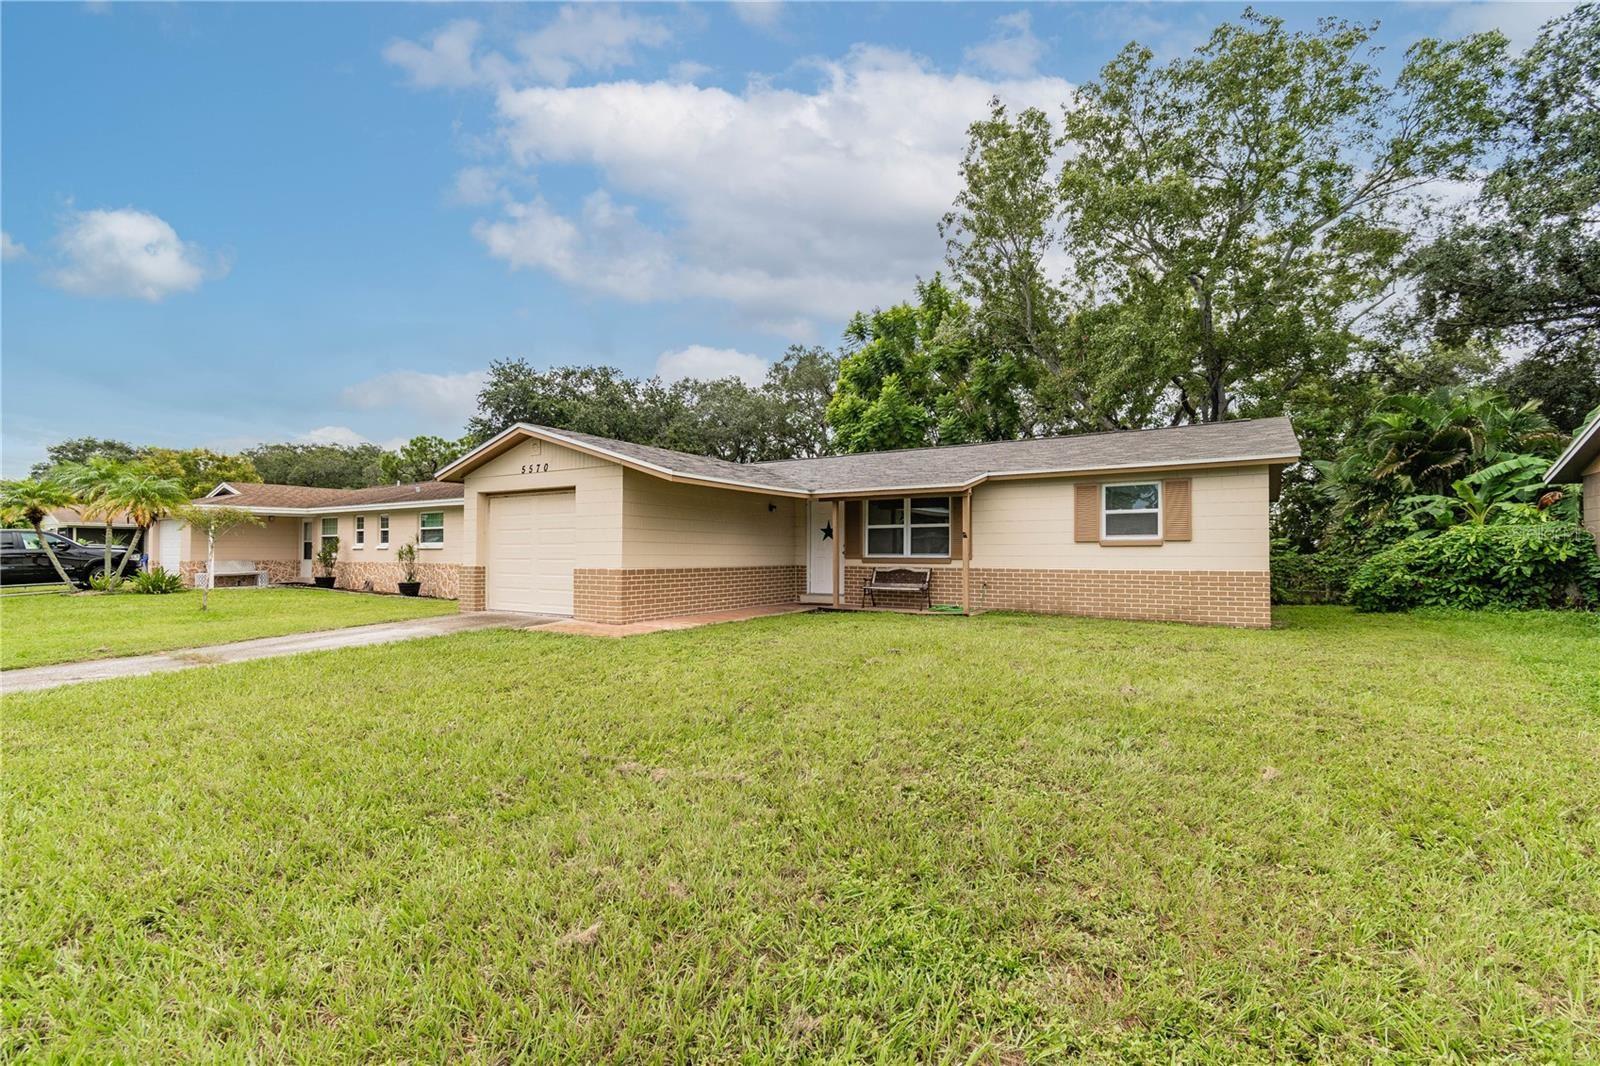 5570 146TH TERRACE N, Clearwater, FL 33760 - #: U8137232